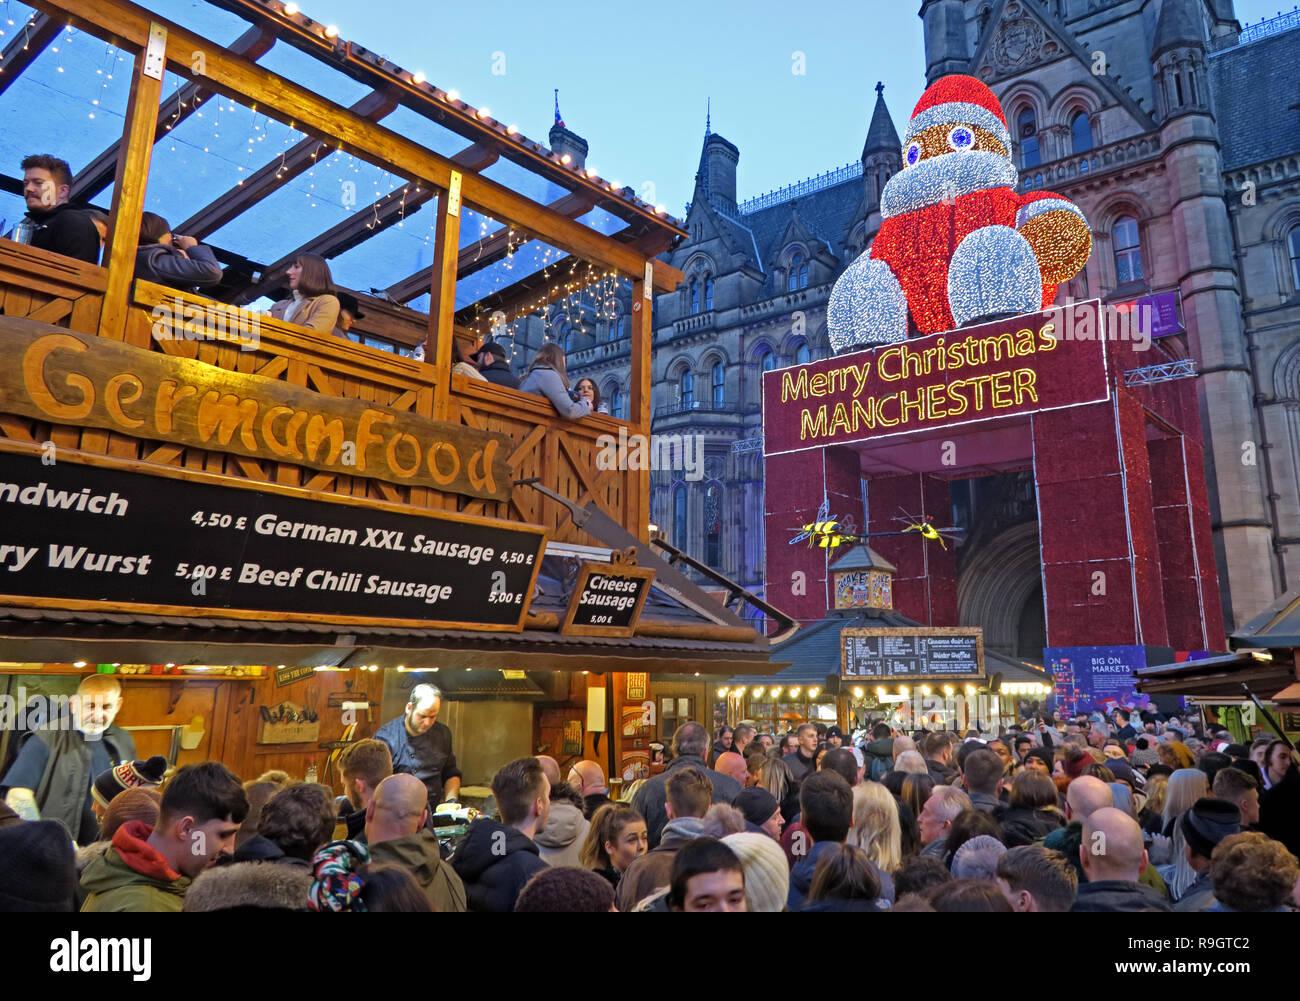 German Food, Christmas markets, Albert Square, Manchester, Lancashire, north West England, UK, at dusk Stock Photo